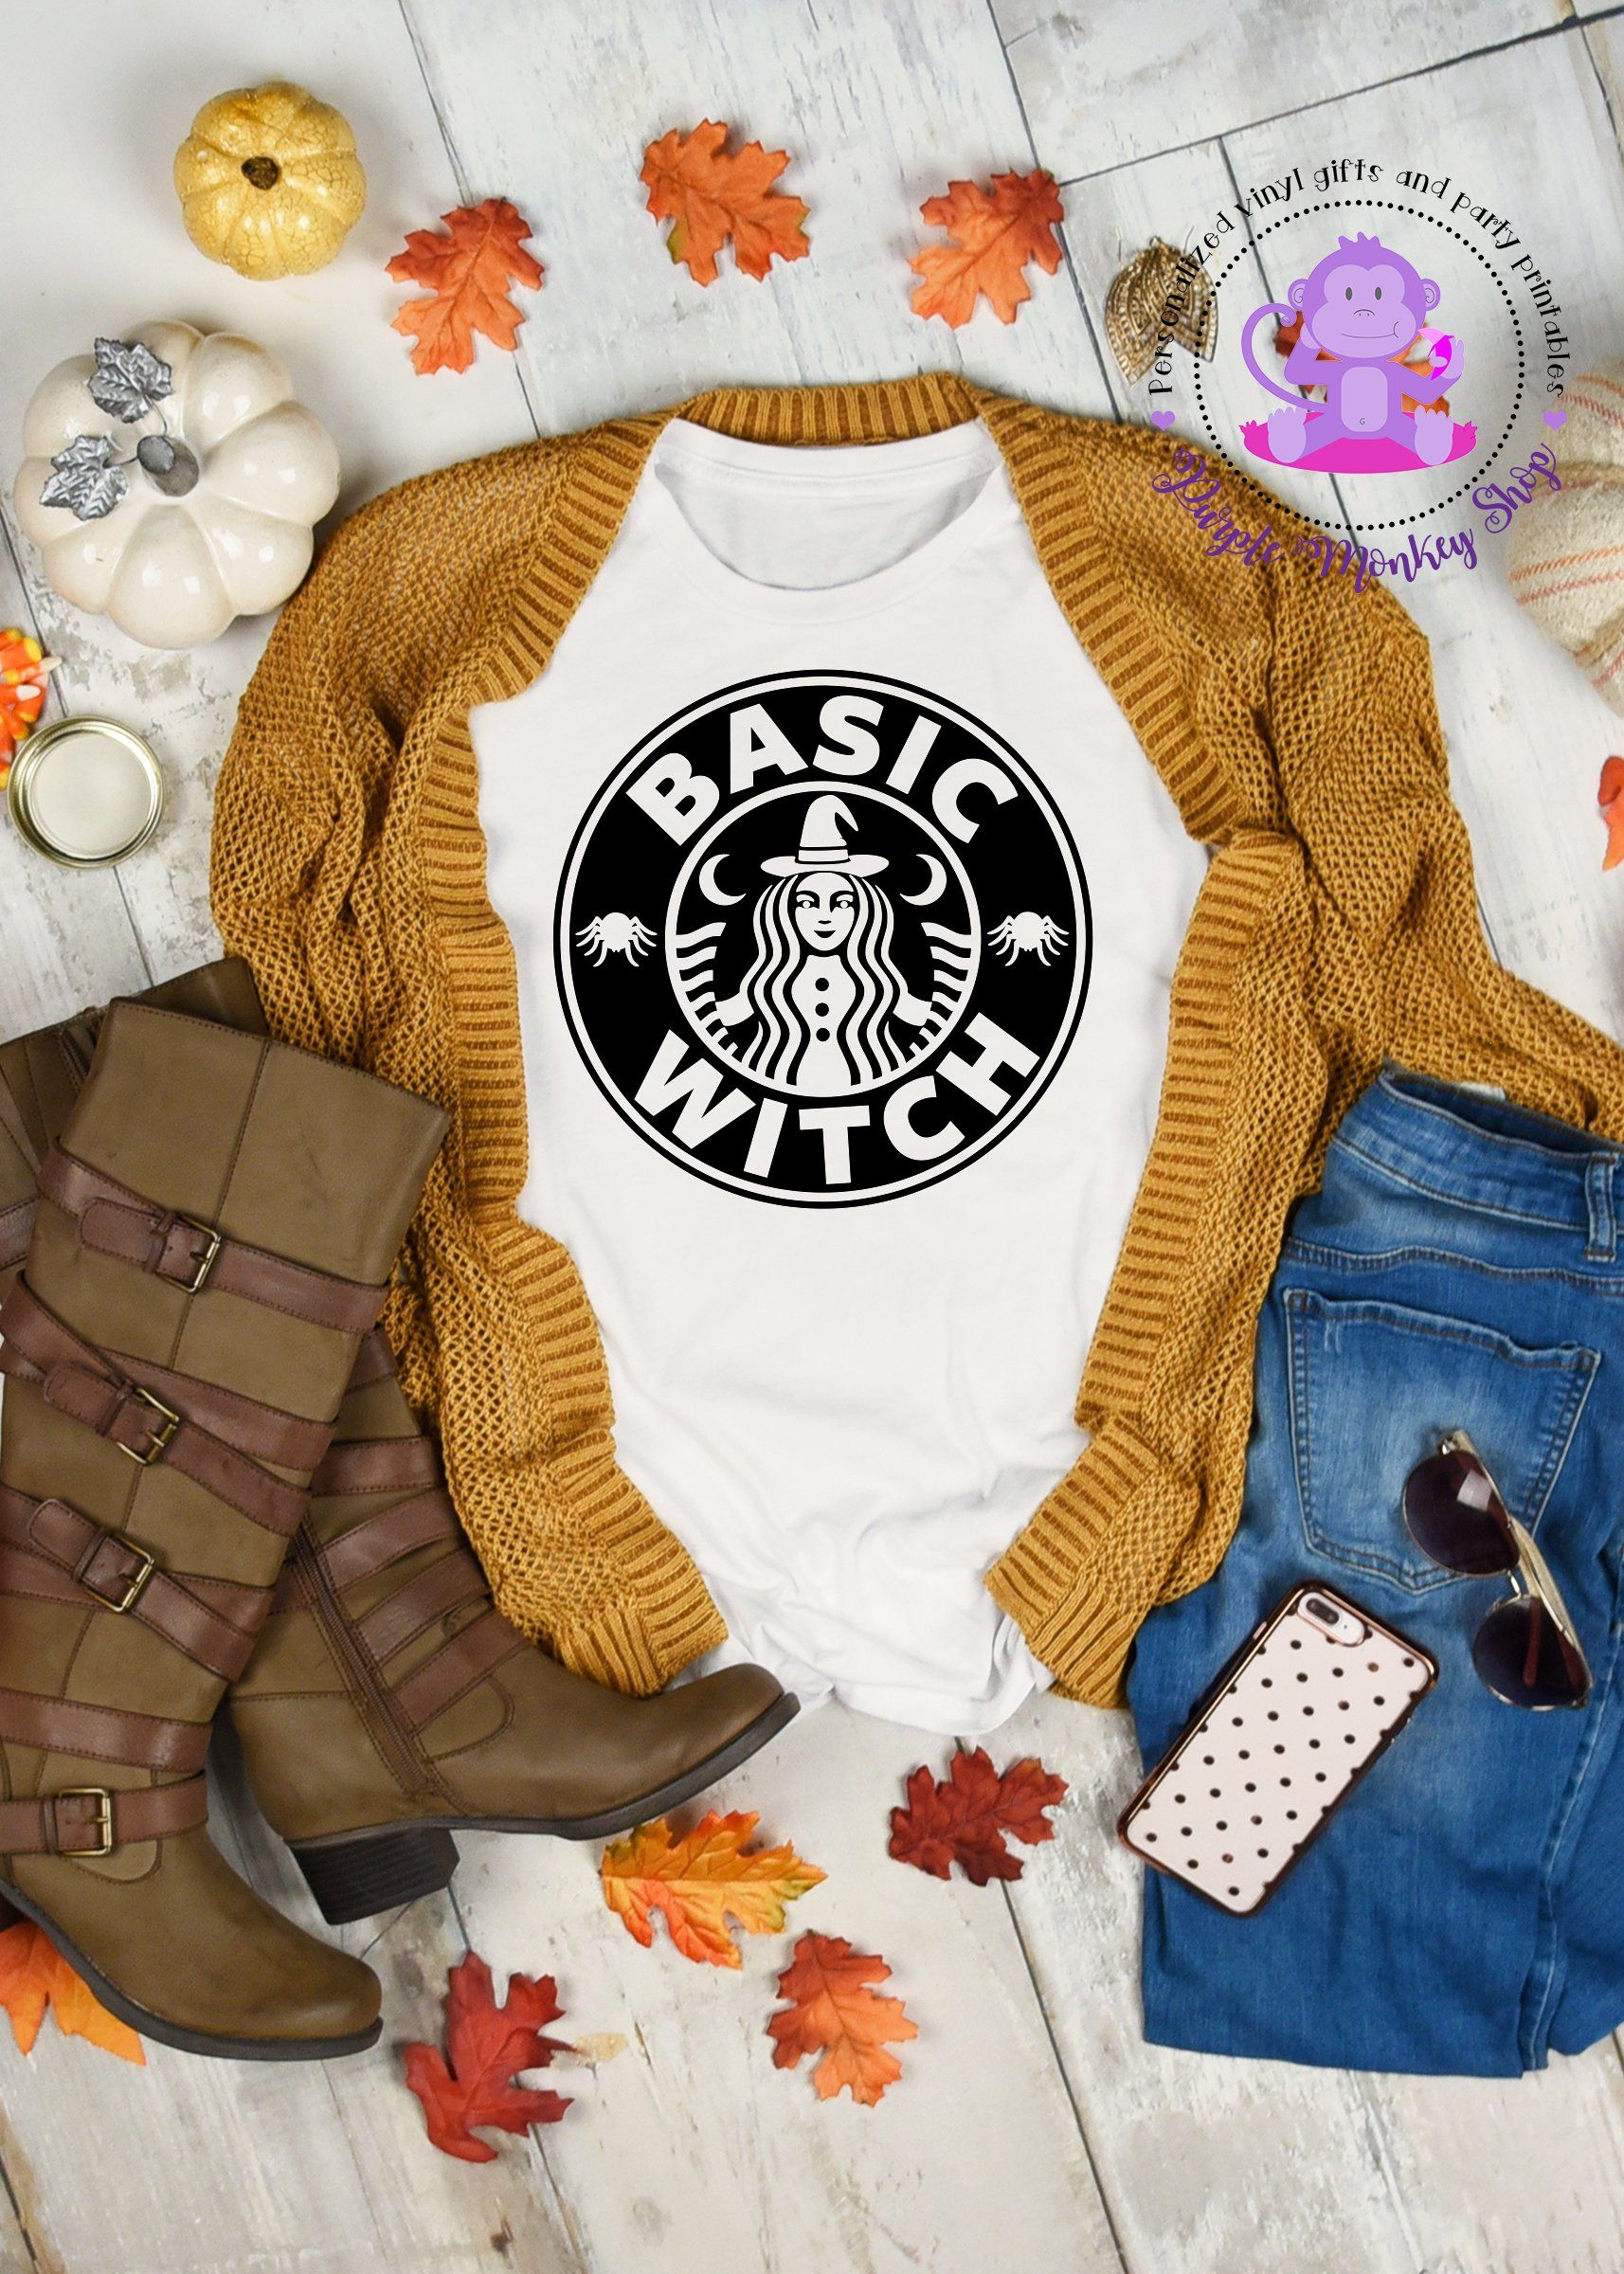 Basic Witch Starbucks Halloween Shirts